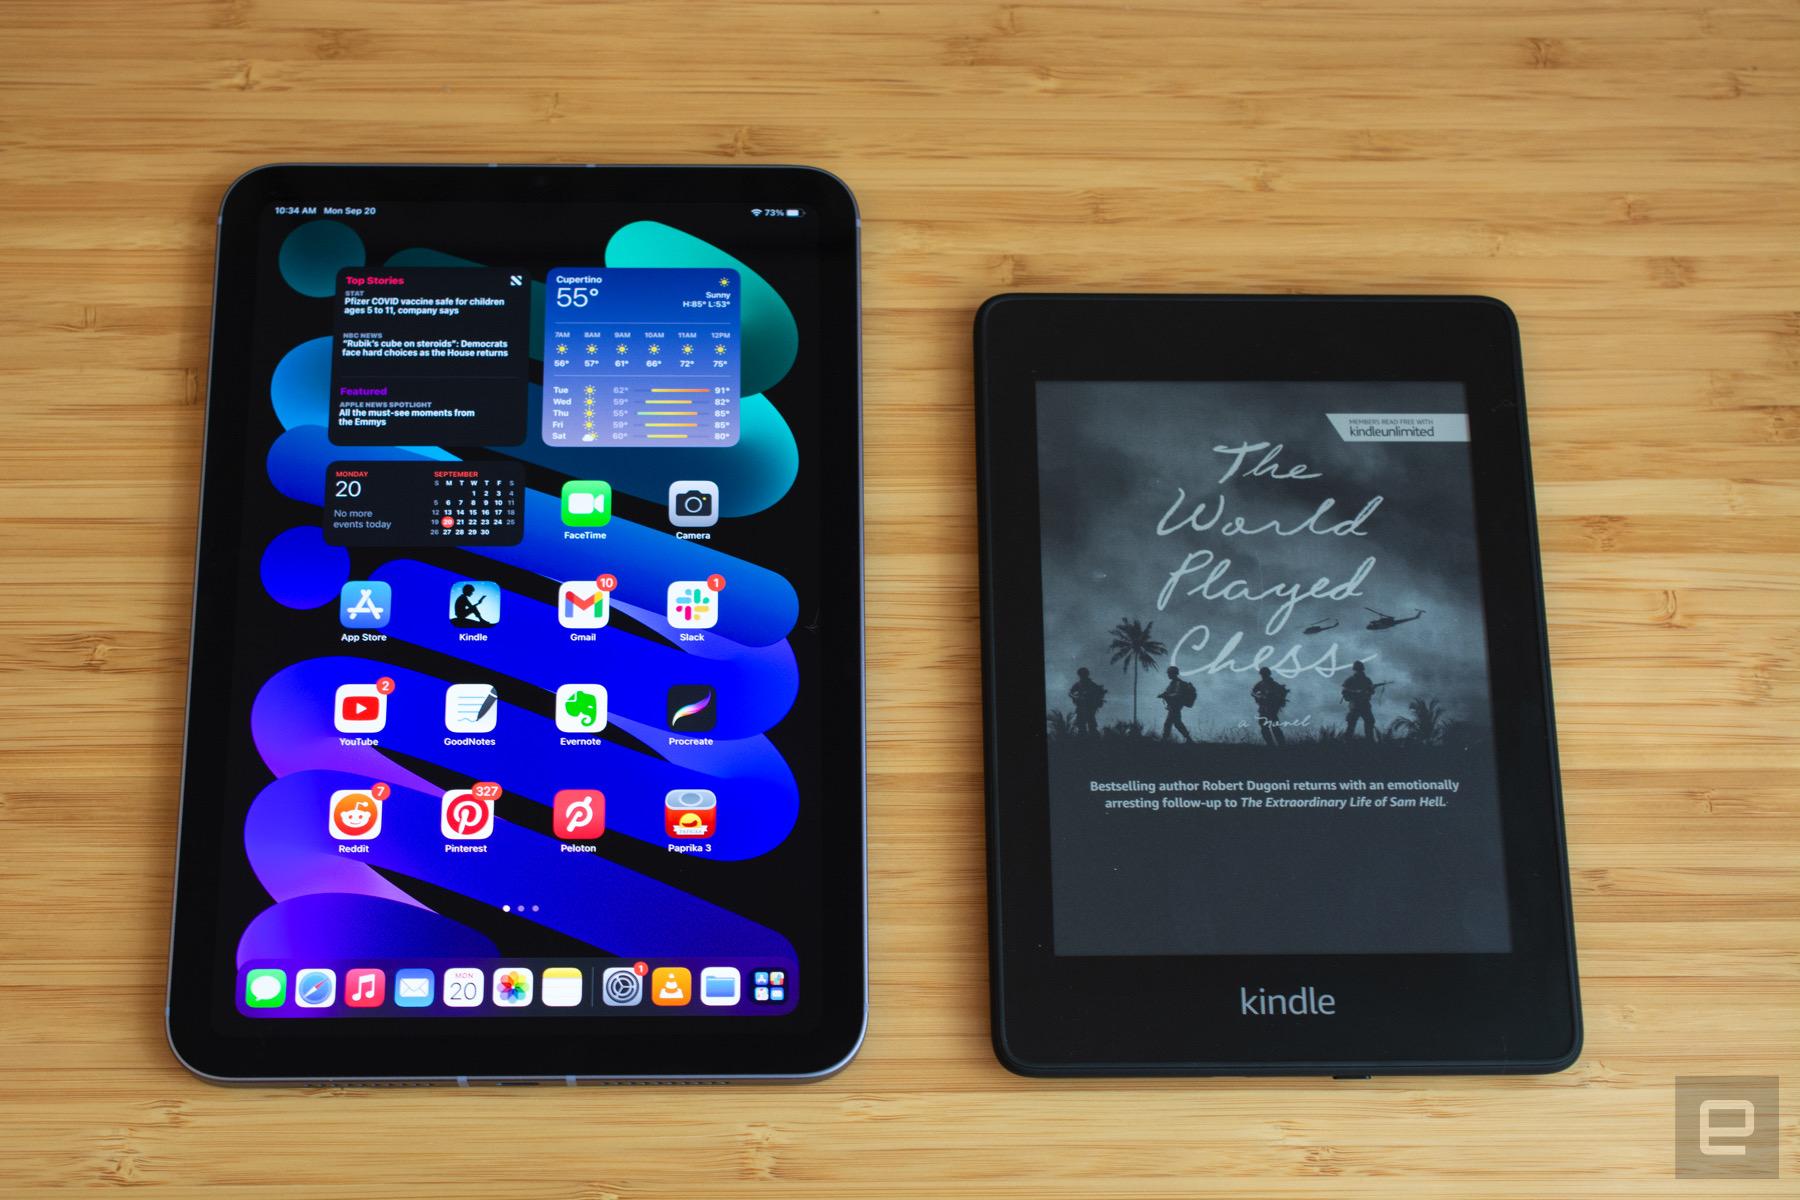 <p>Apple's iPad mini next to Amazon's Kindle Paperwhite.</p>